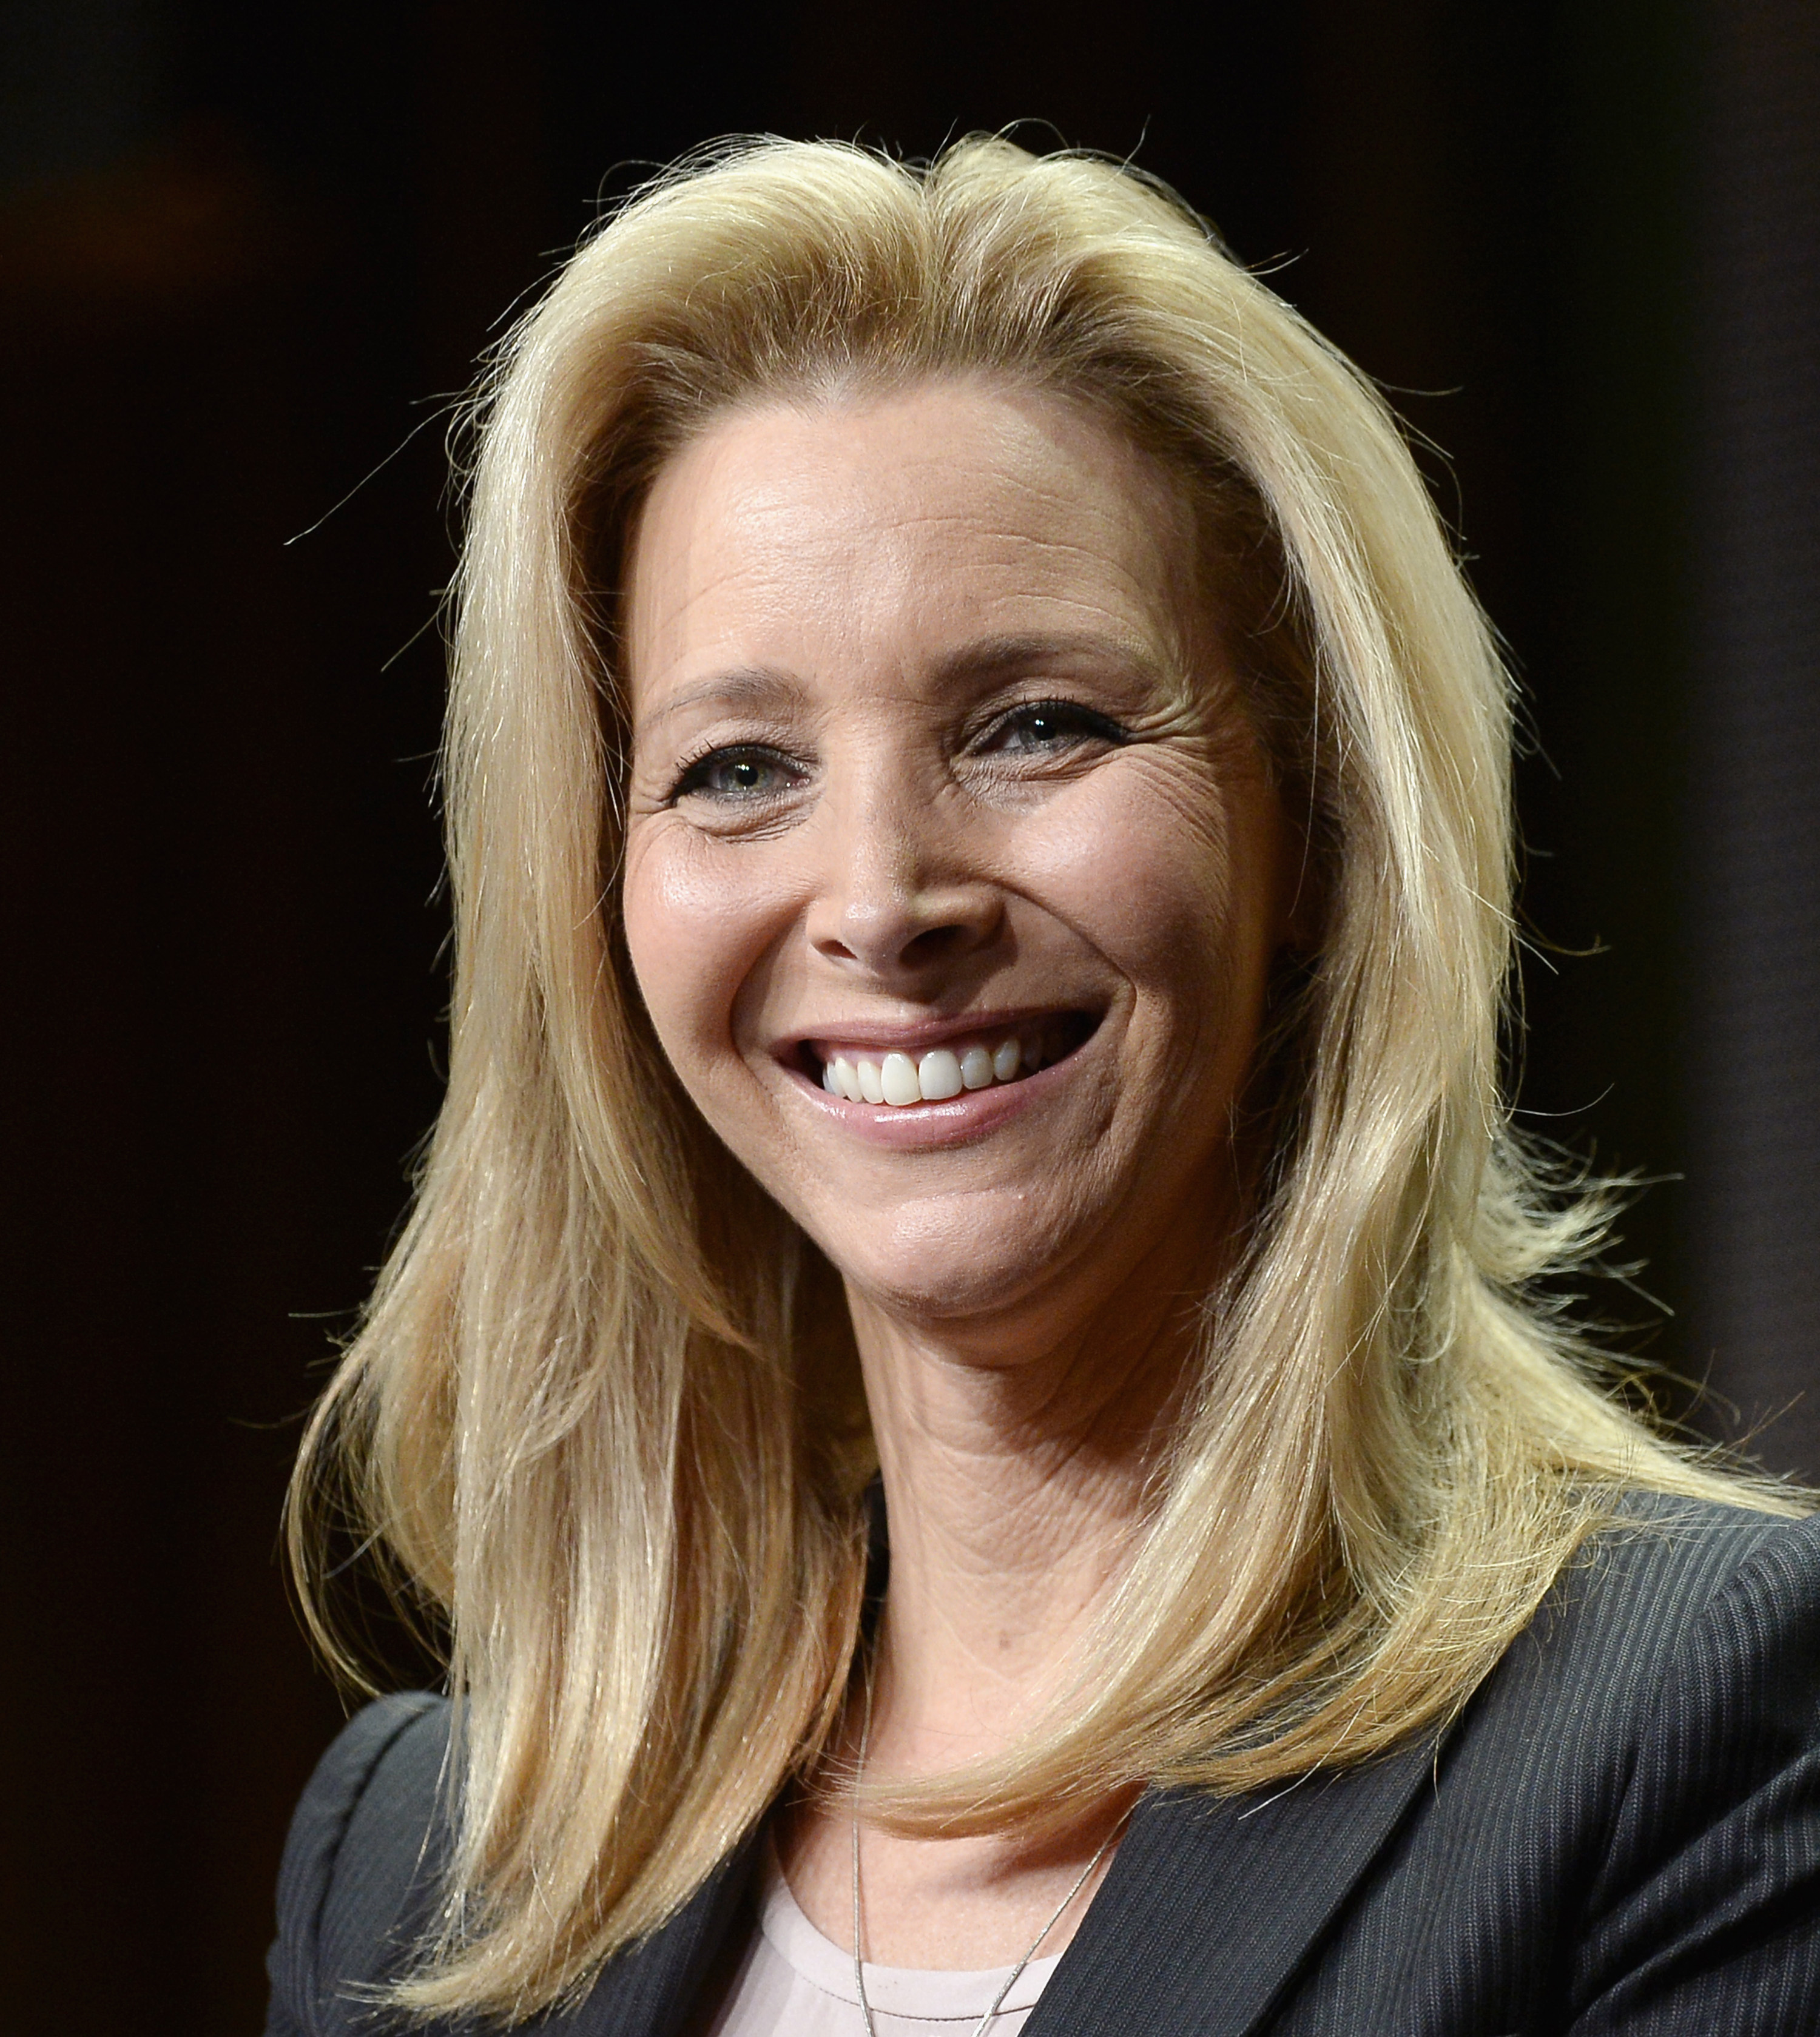 Lisa Kudrow bashes Sony execs after leaked emails